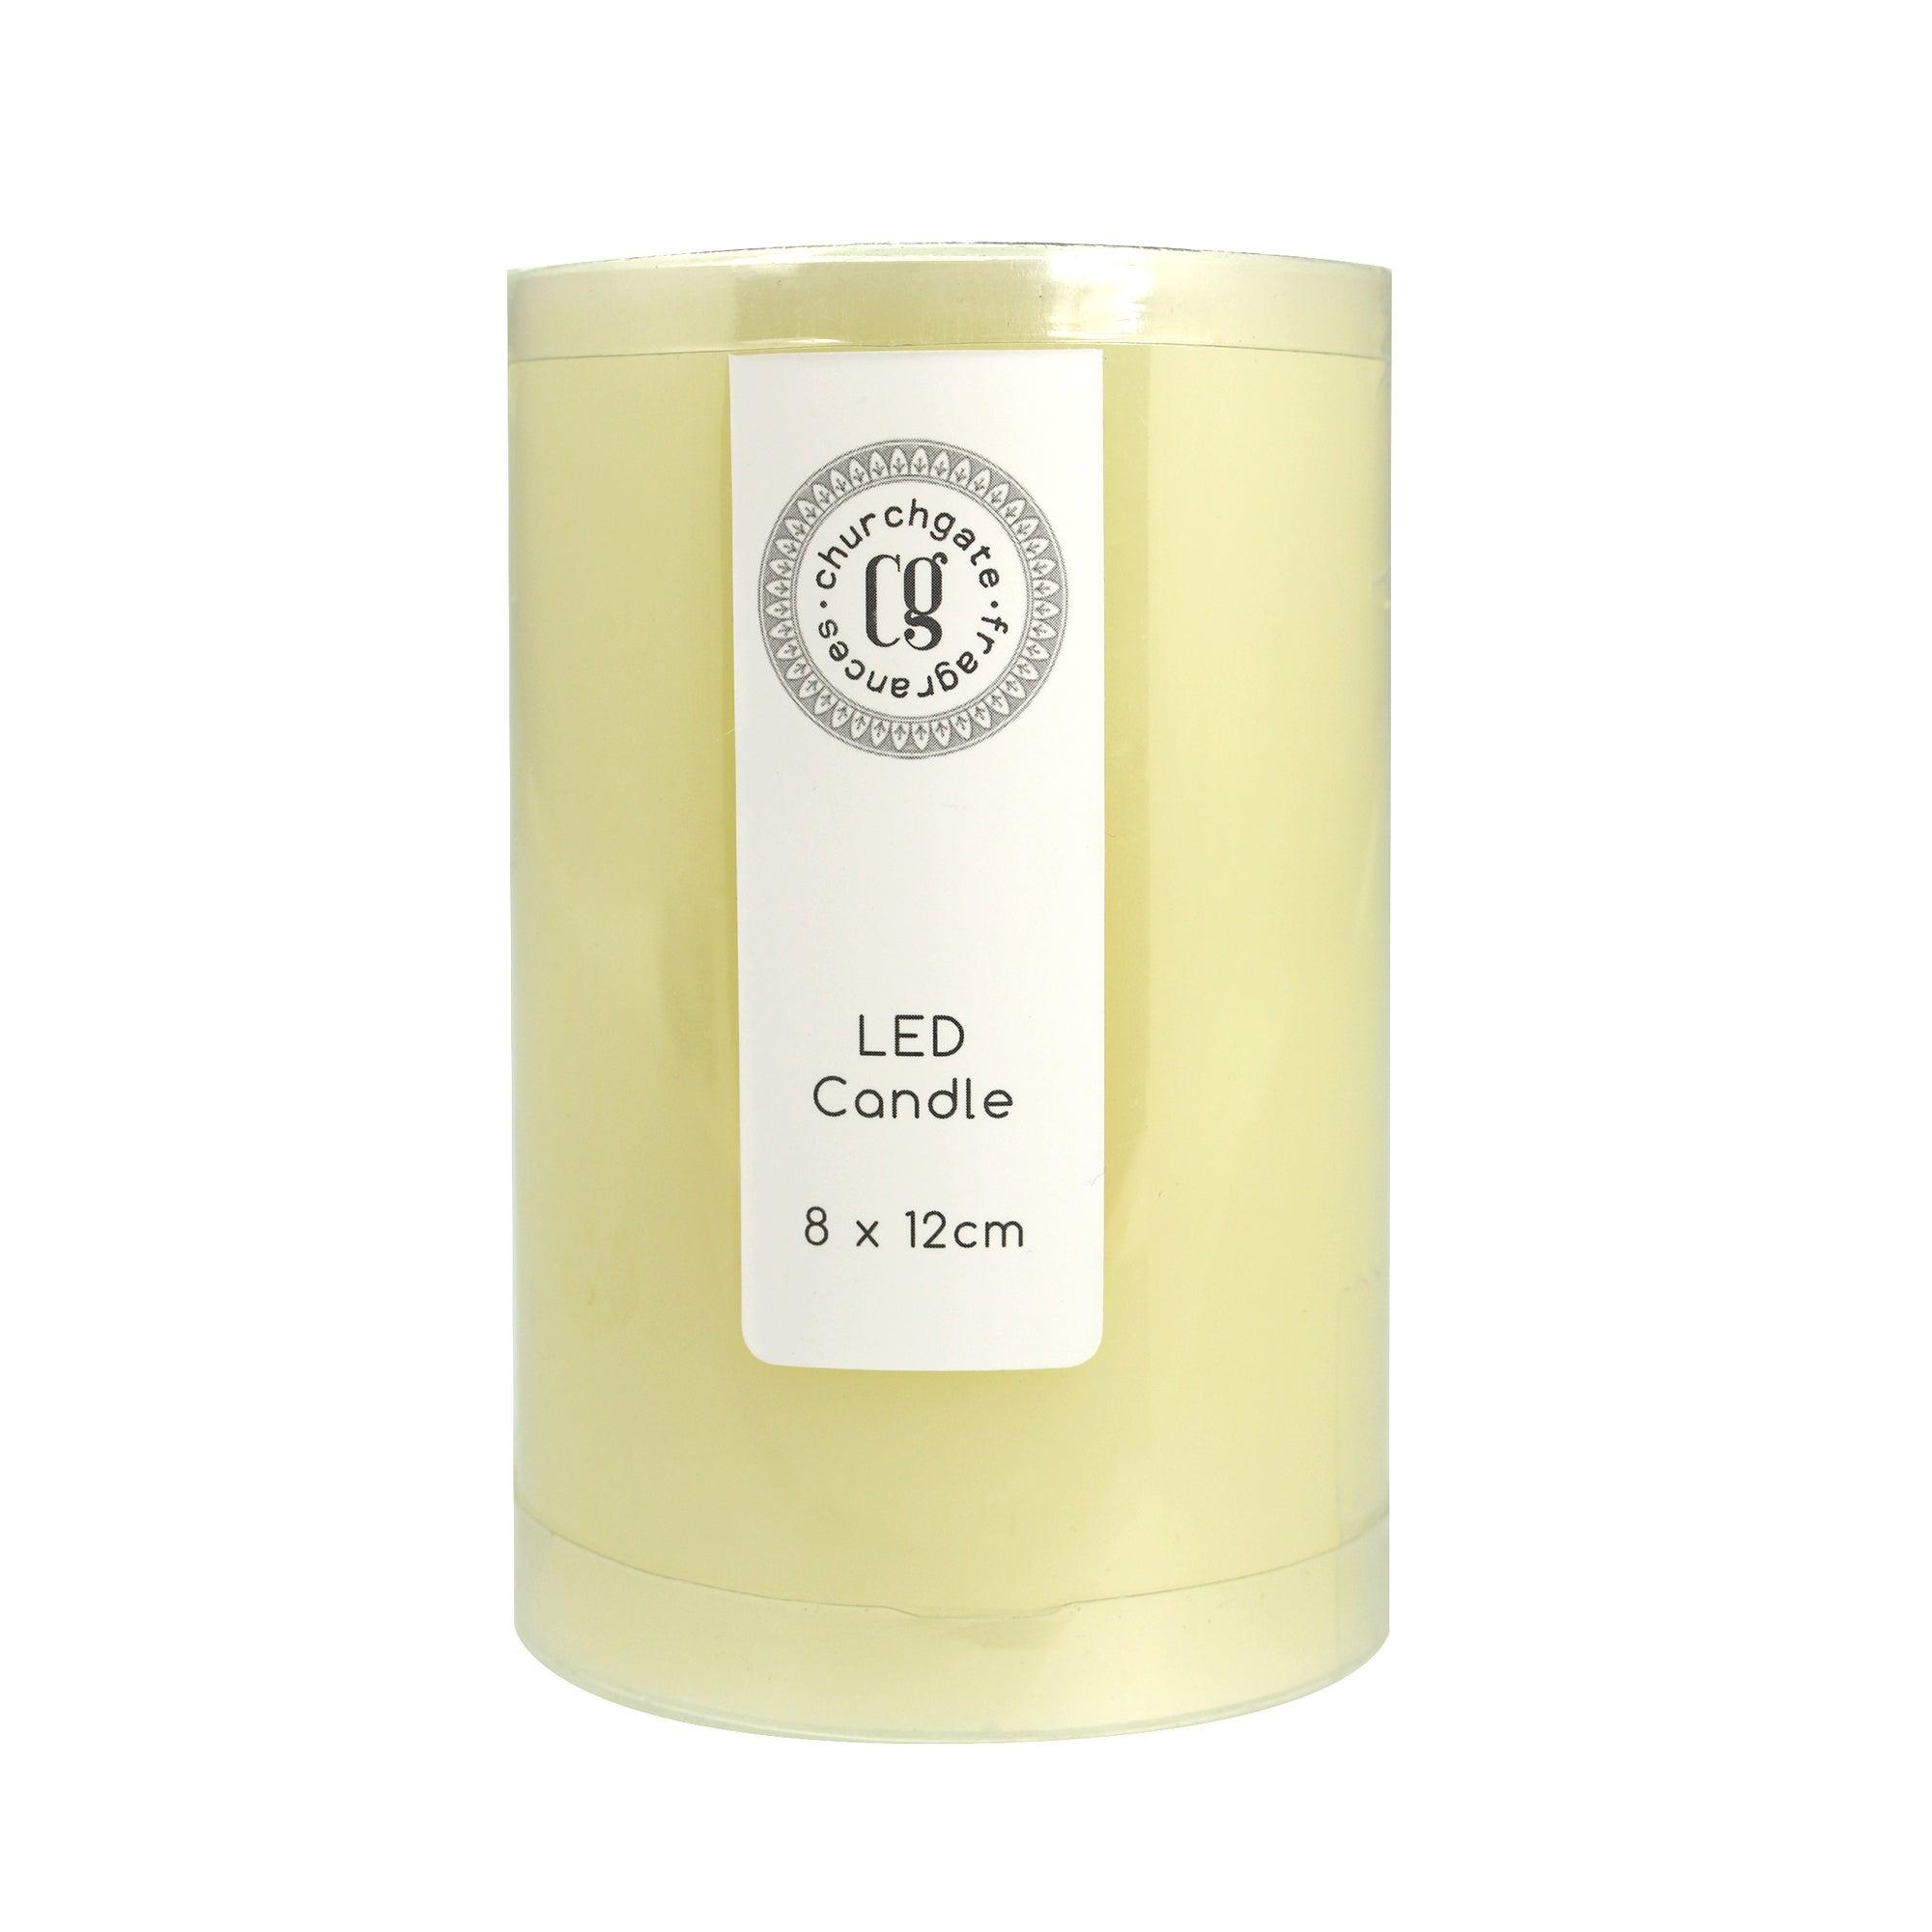 Led Church Candle 8cm X 12cm Cream